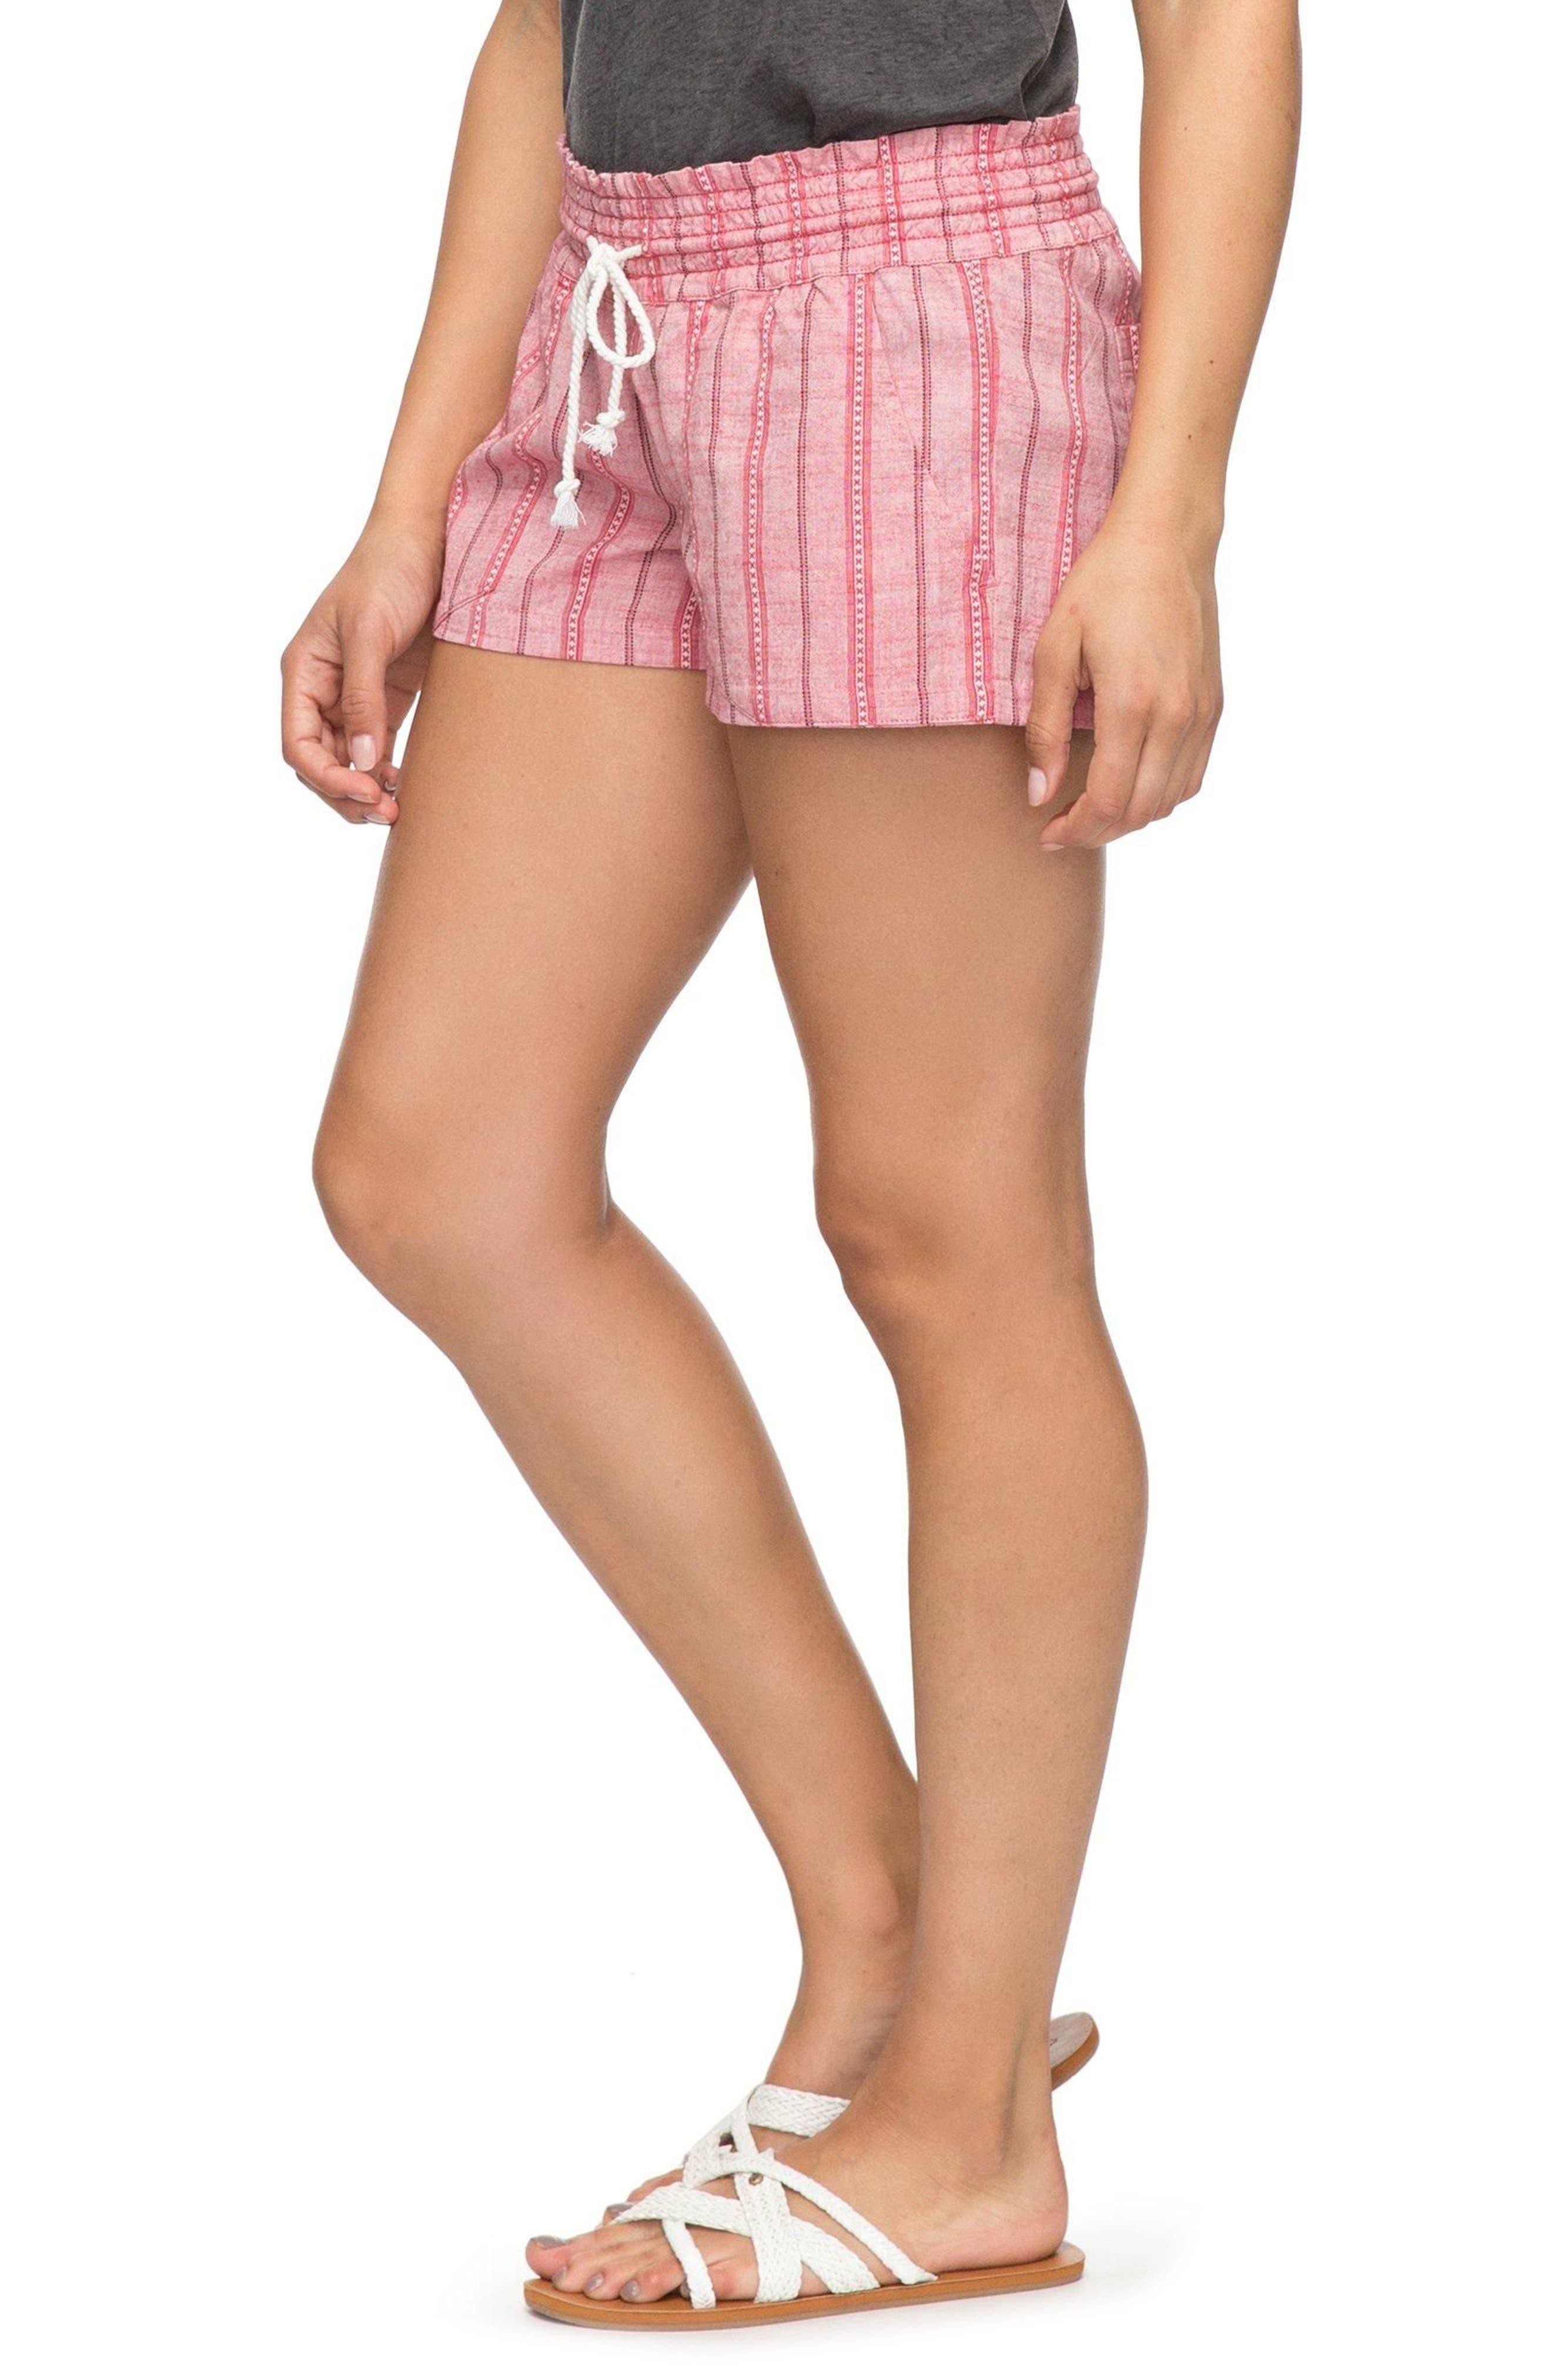 Oceanside Beach Shorts,                             Alternate thumbnail 4, color,                             Holly Berry South Border